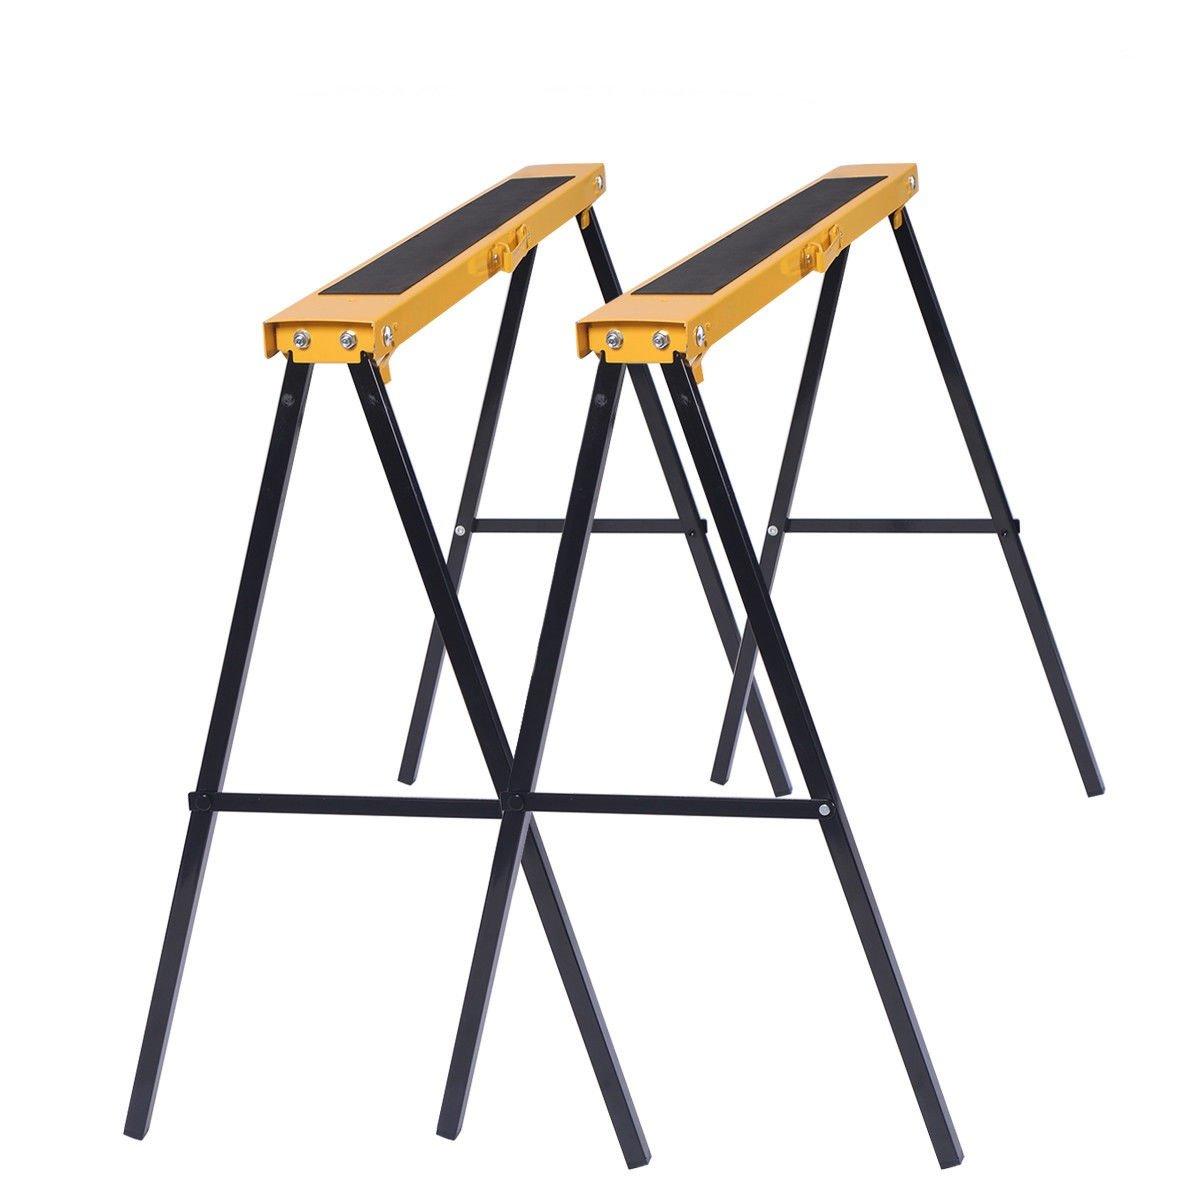 2Pcs Portable Steel Saw Horse Capacity 250 Lbs w/ Foldable Legs